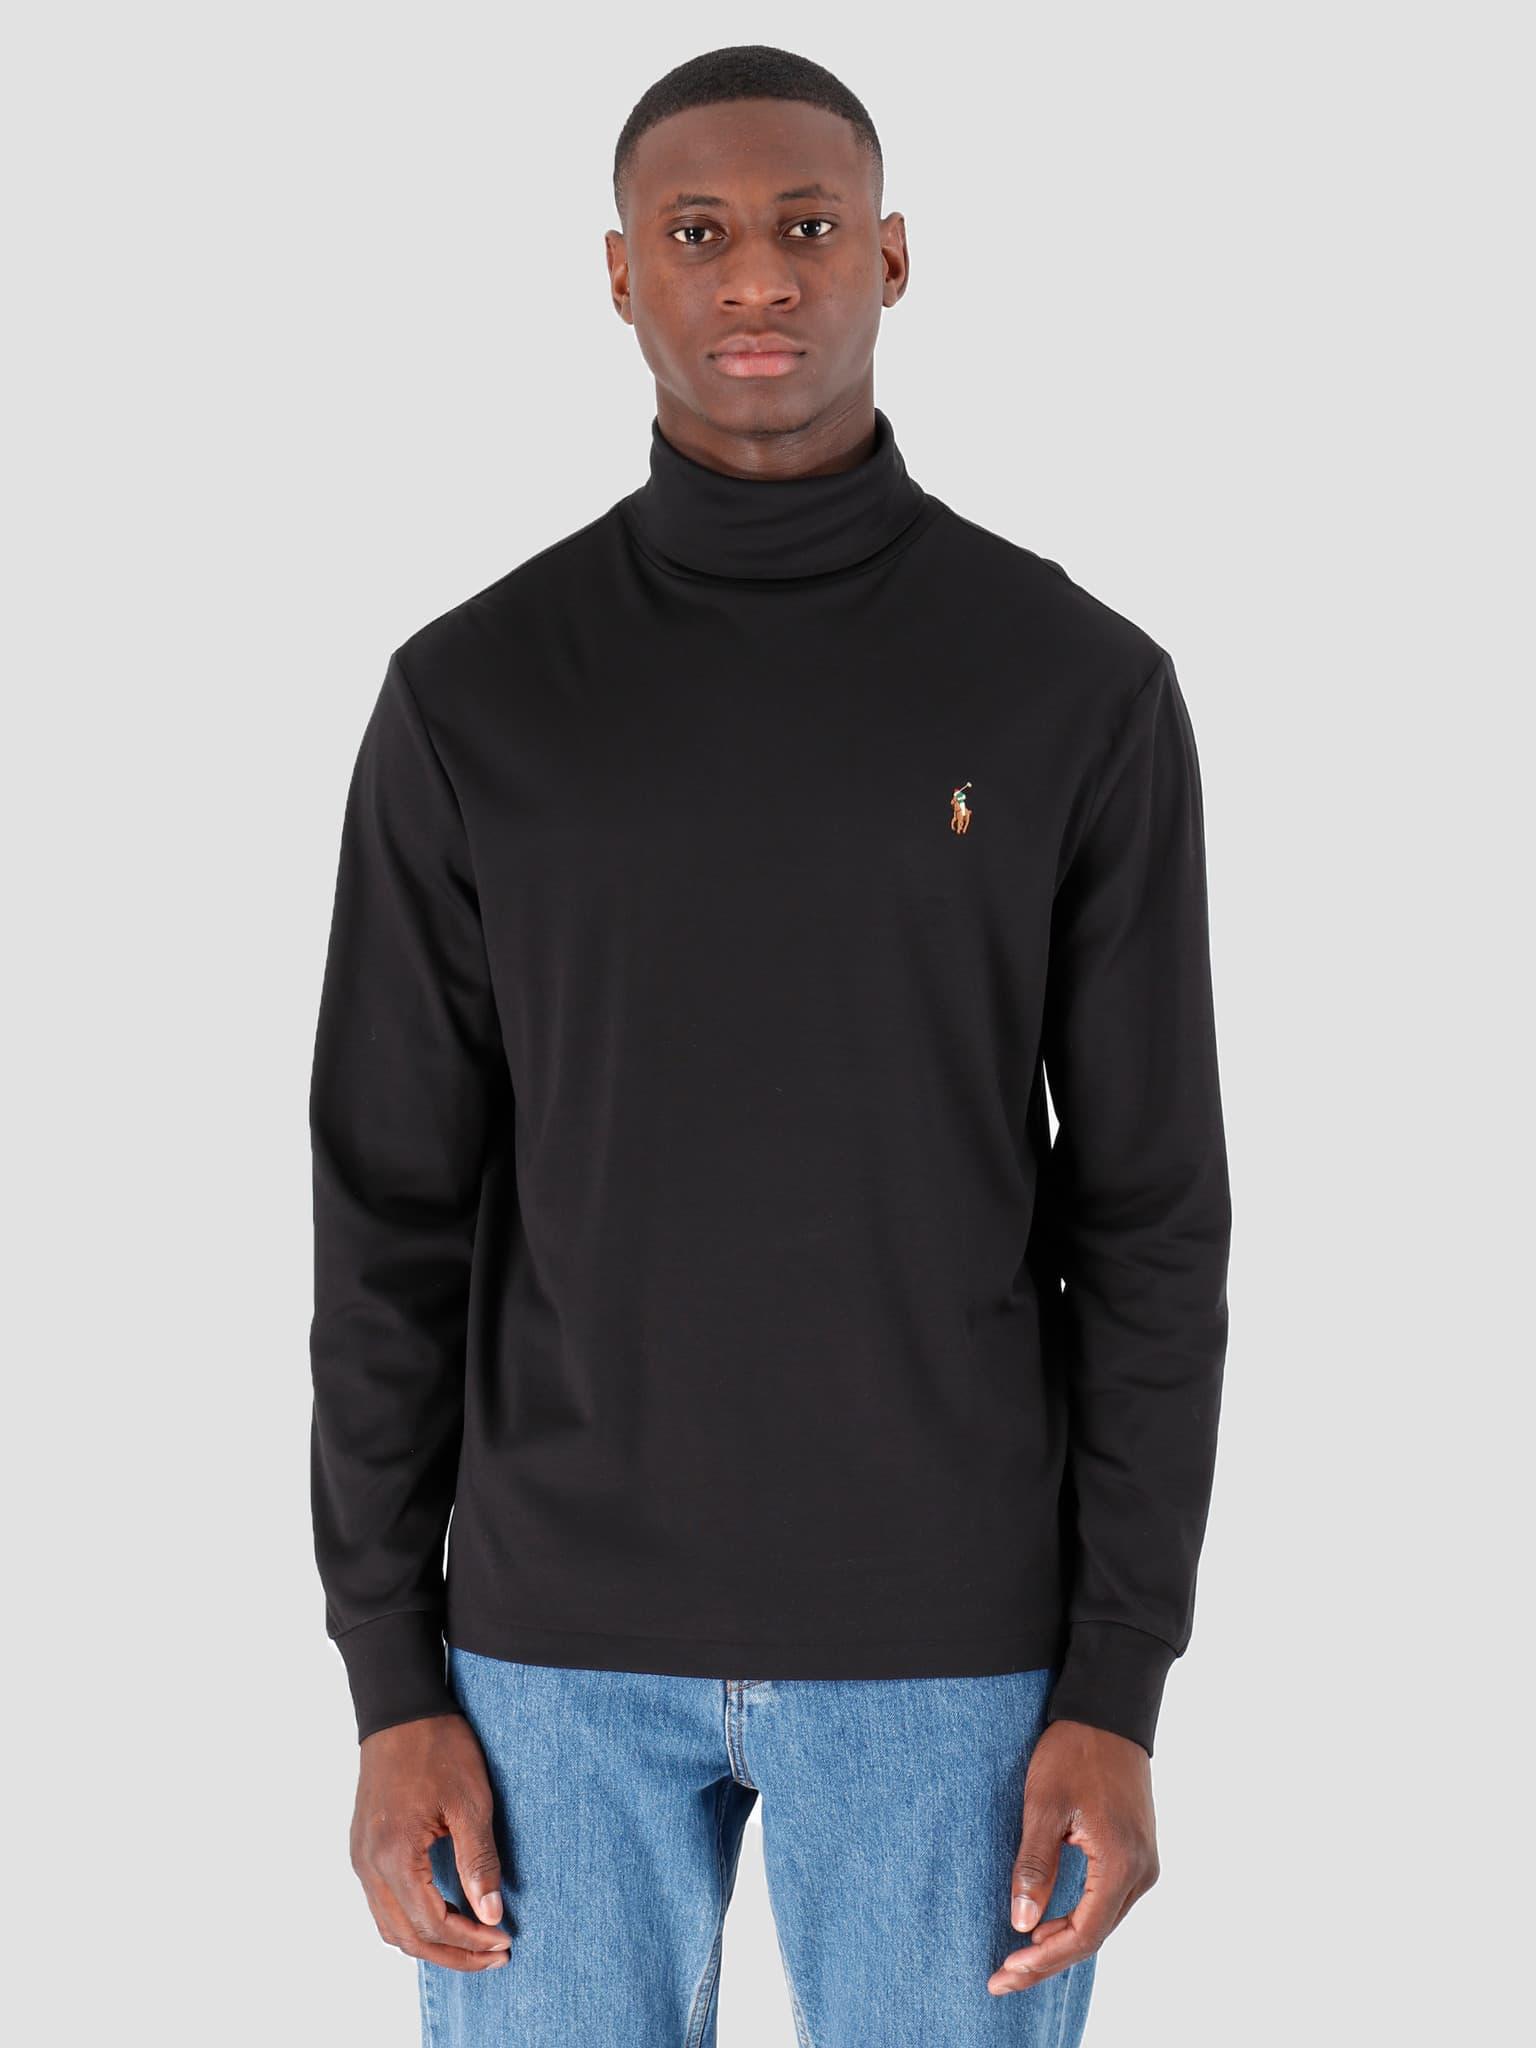 Lsturtlem1 Long Sleeve Knit Polo Black 710760126001